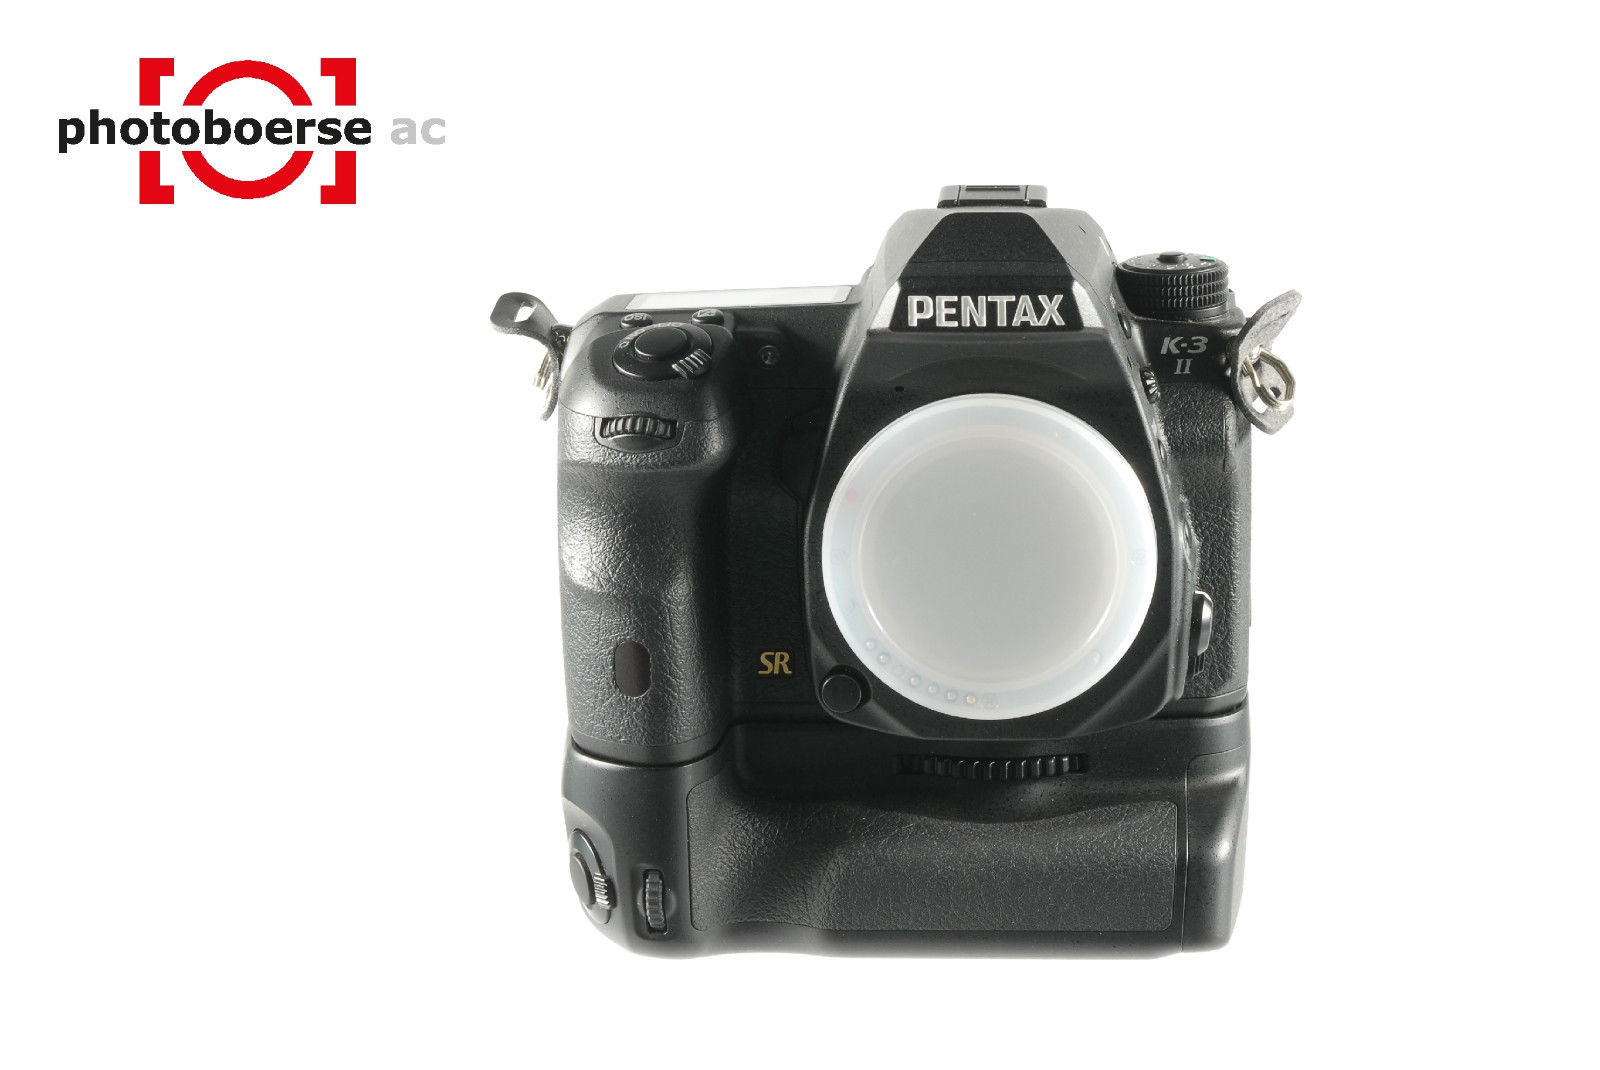 RICOH PENTAX K-3 II